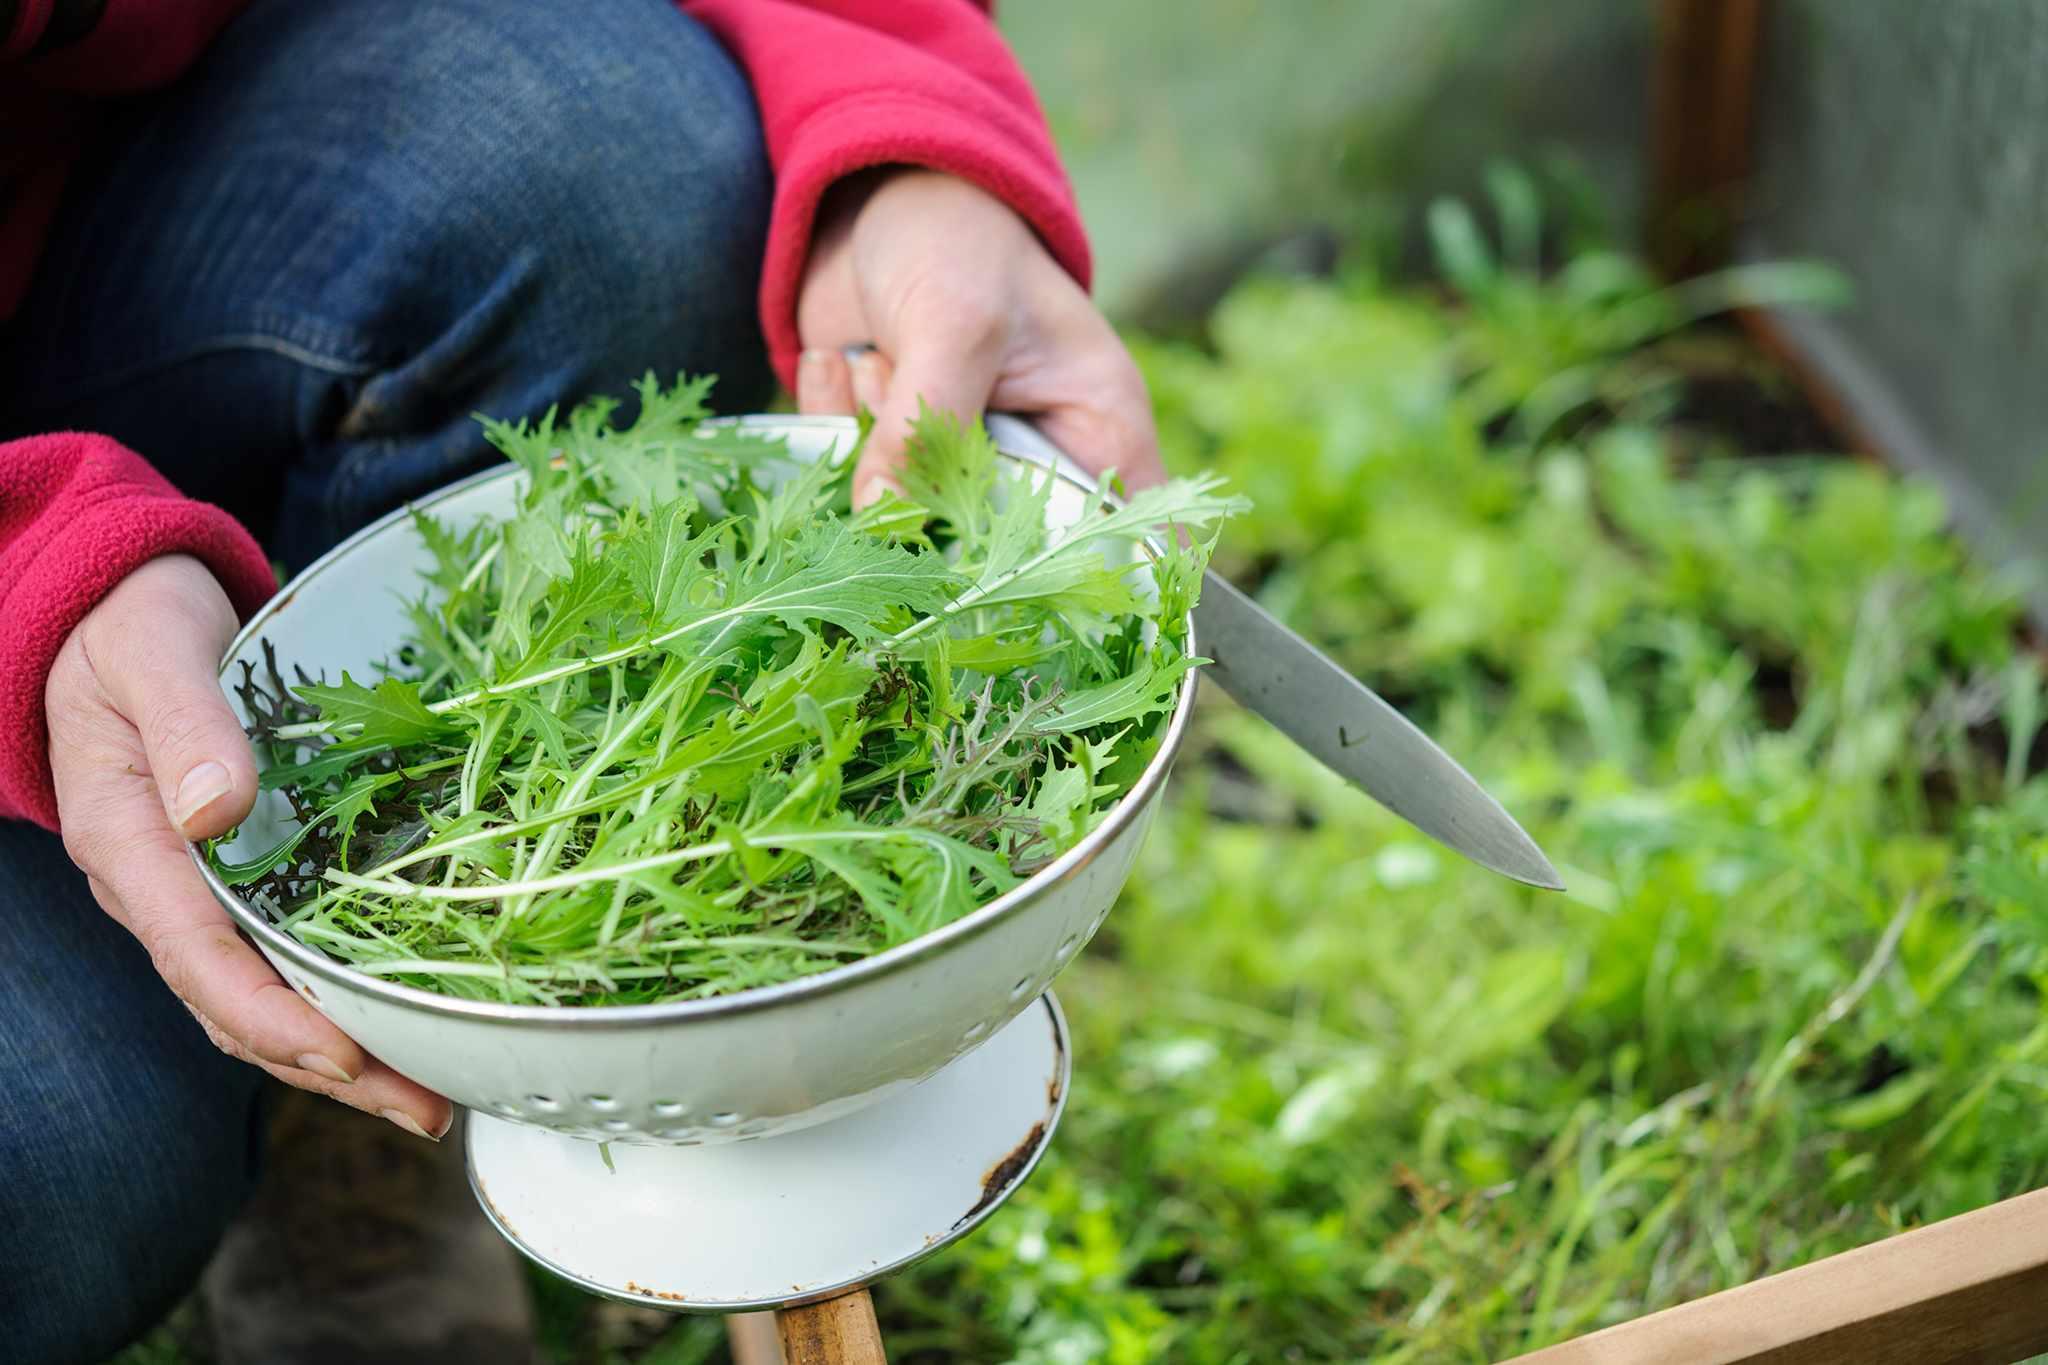 Harvested winter salad